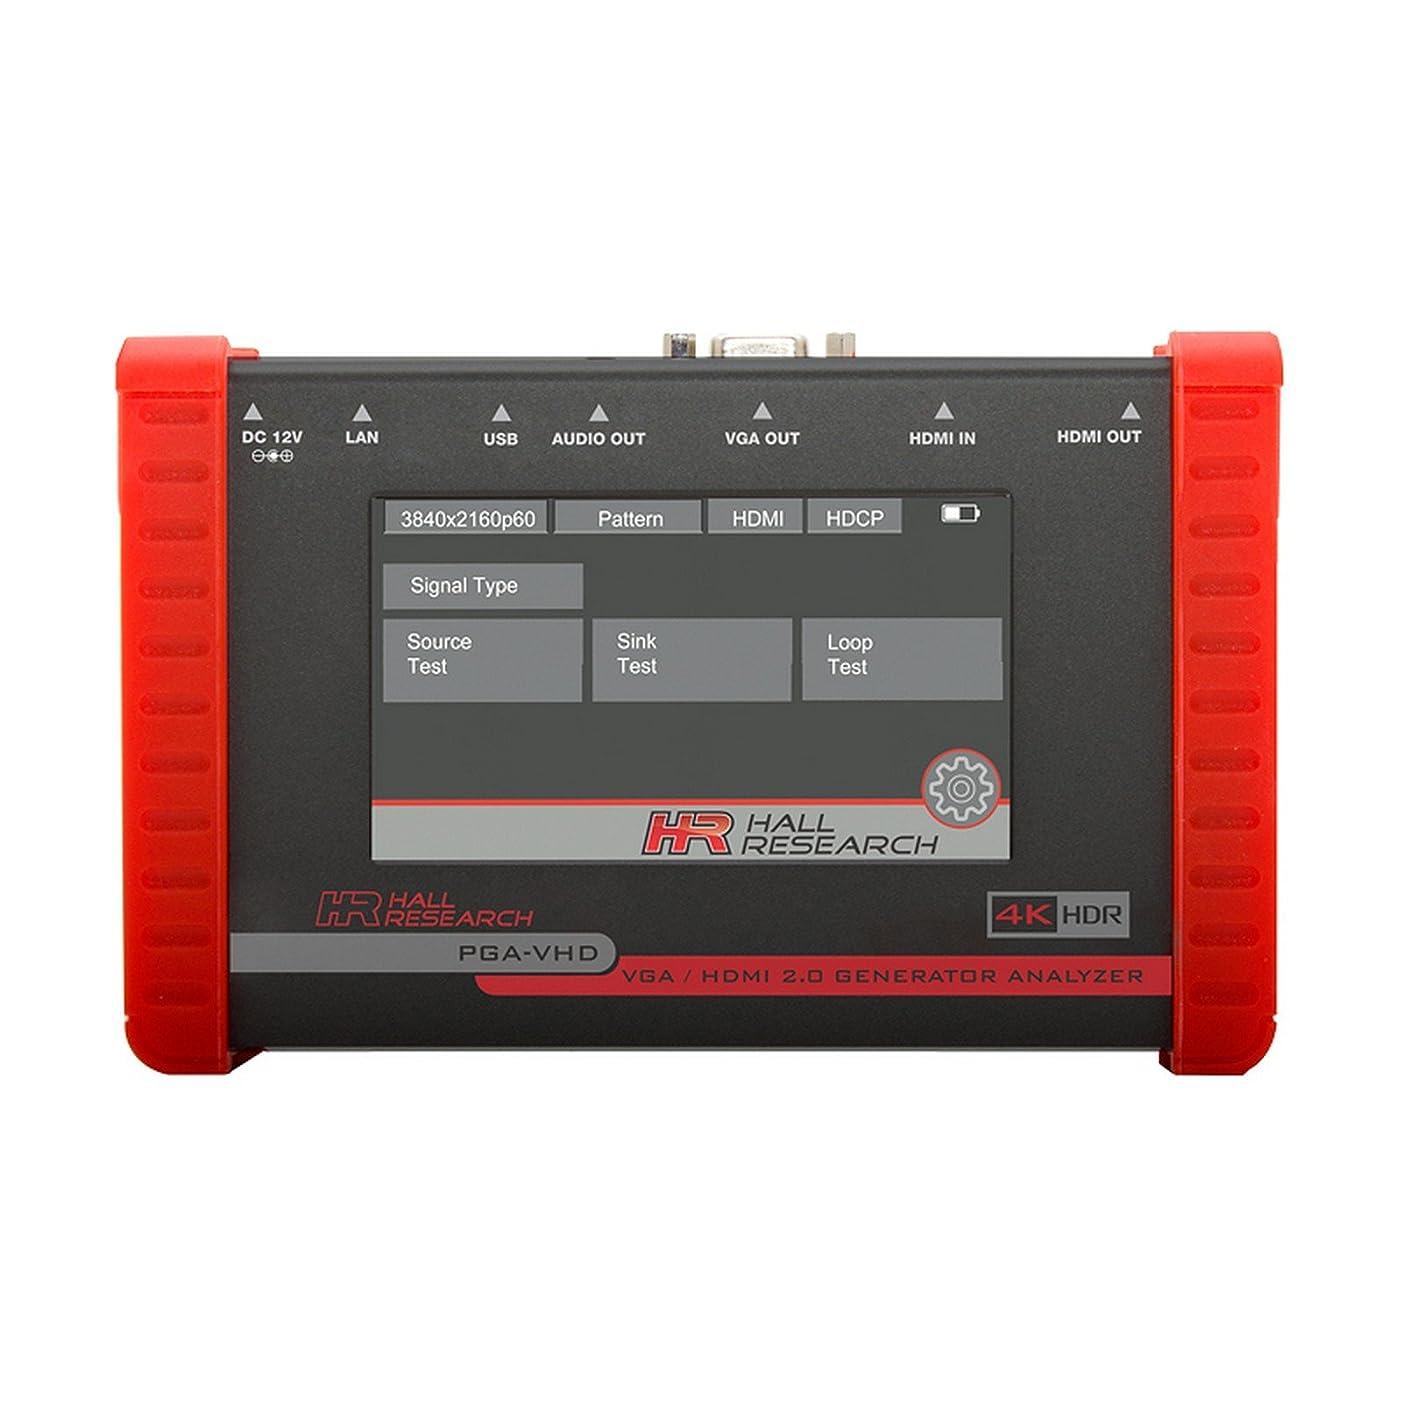 Hall Research PGA-VHD | HDMI VGA Video Generator Tester and Analyzer